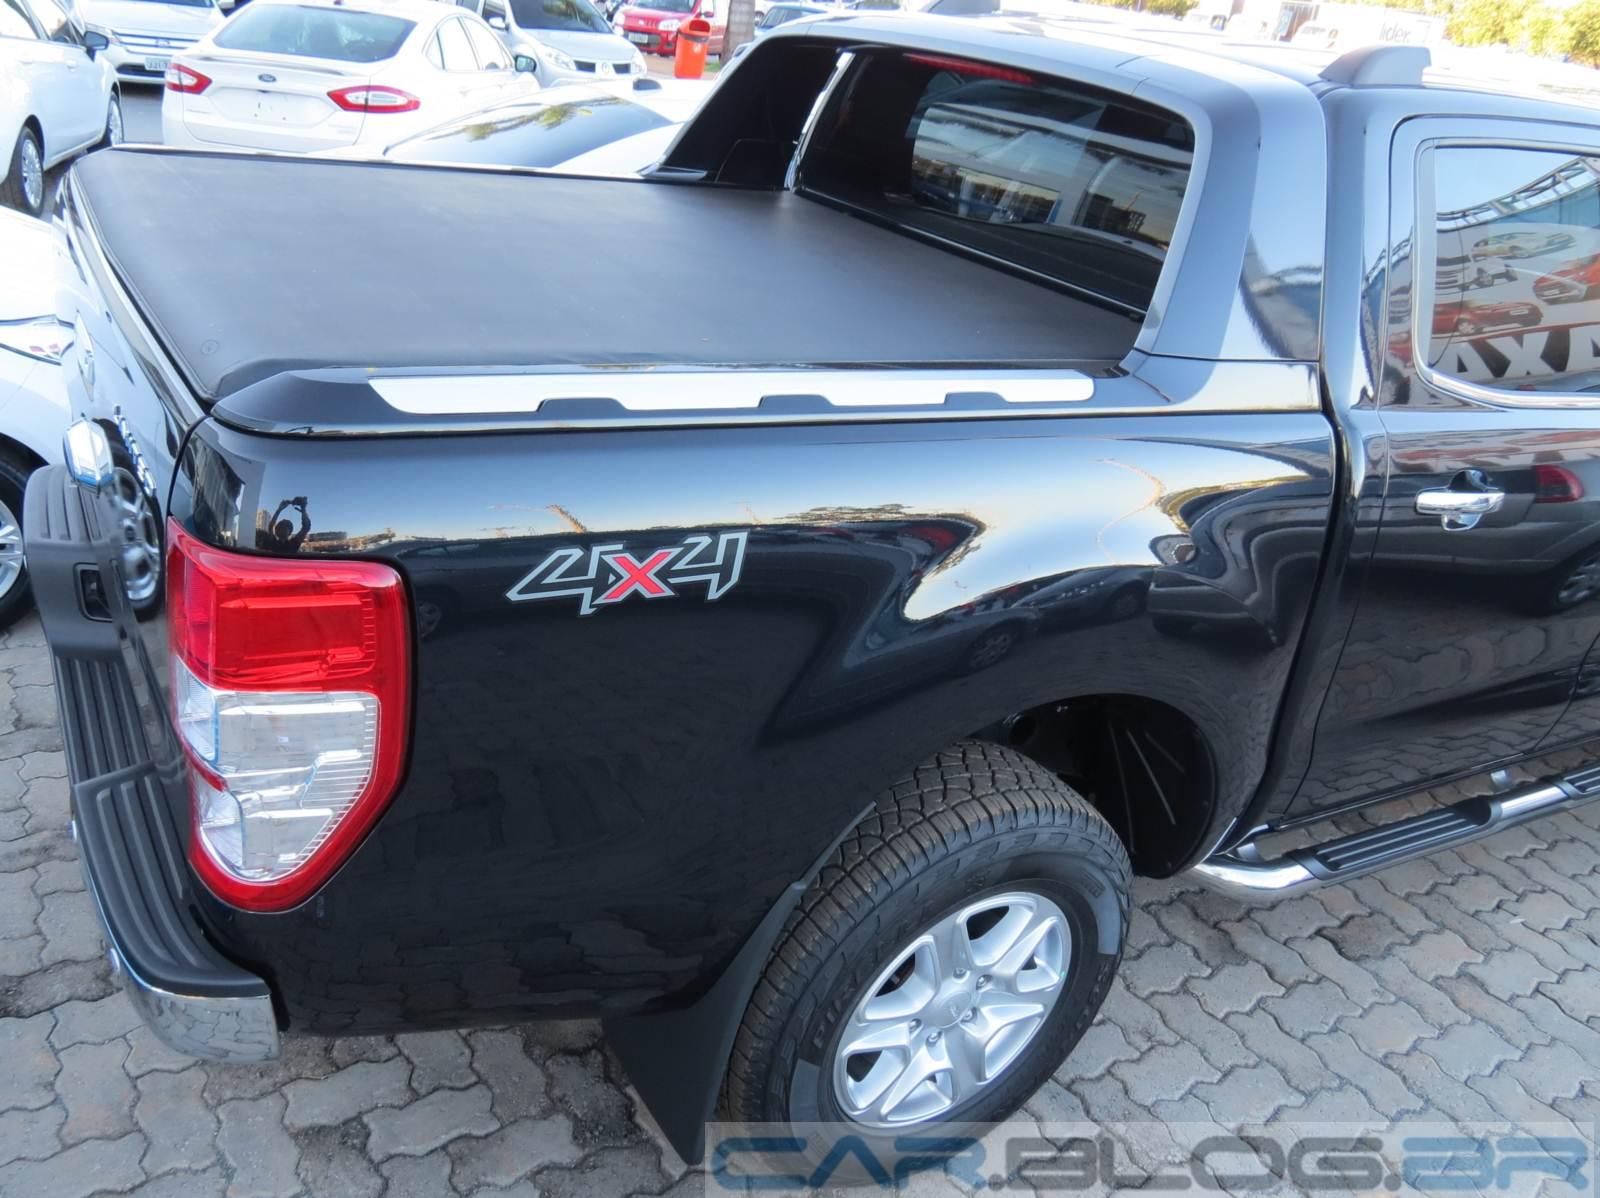 Ford ranger cabine dupla diesel 3 2 4x4 limited plus autom tica